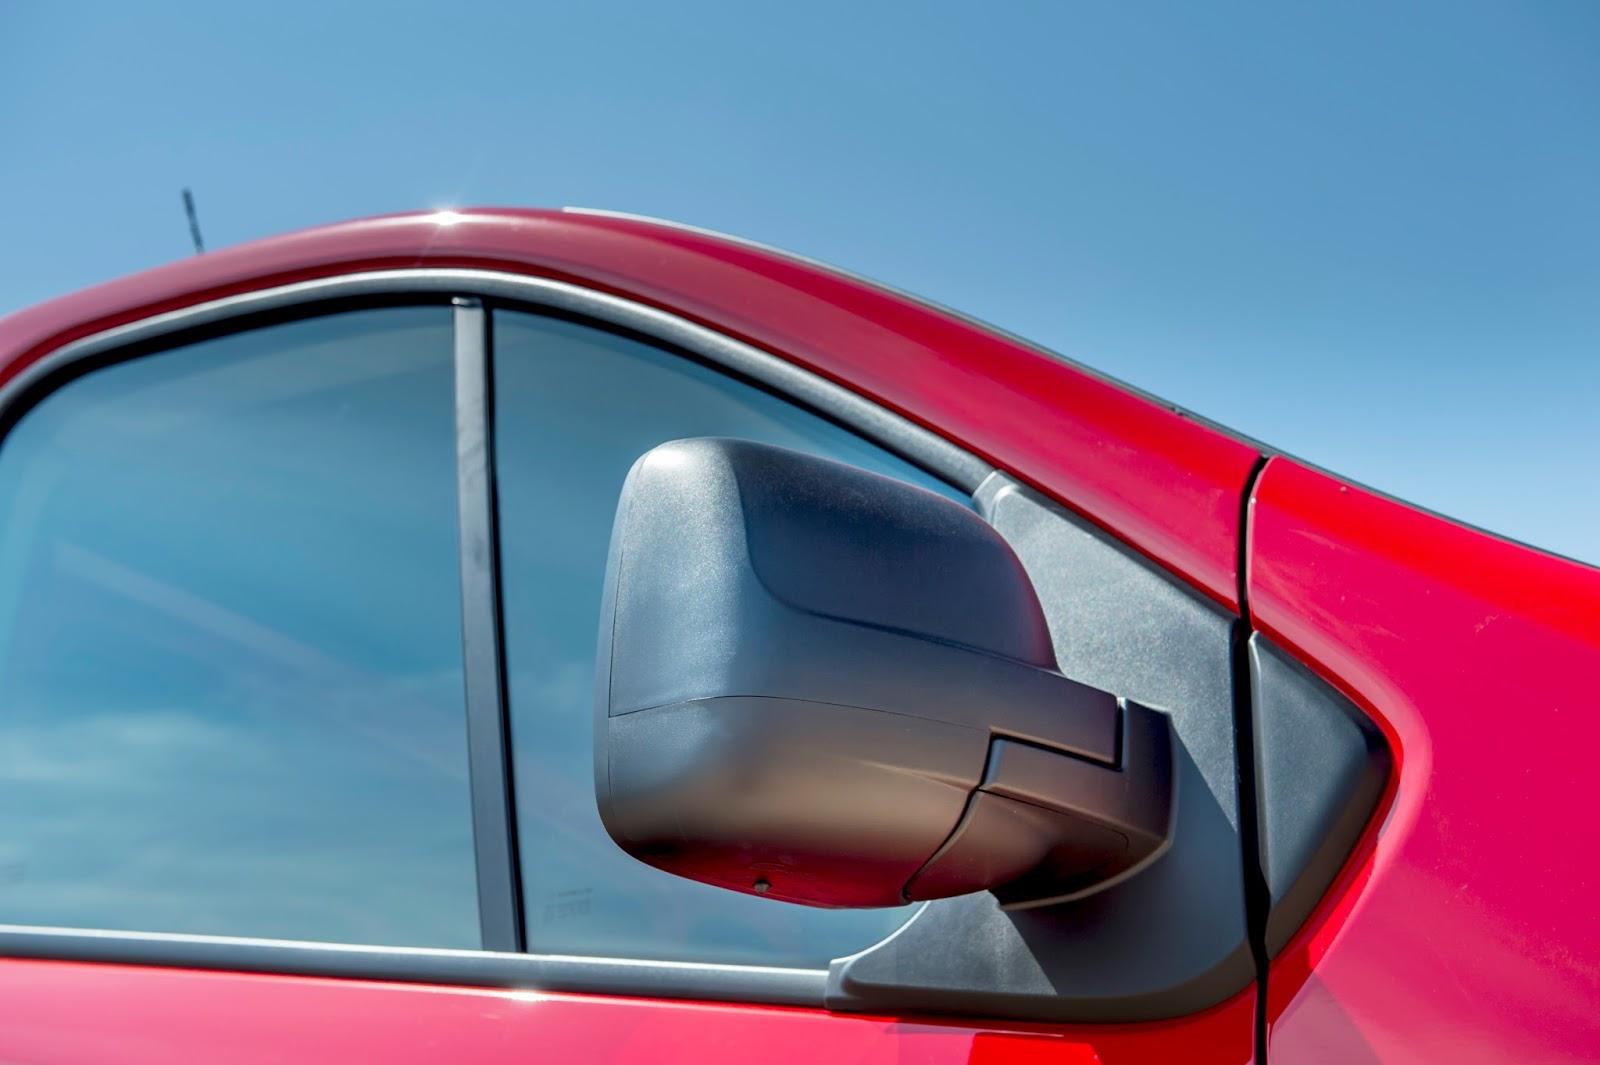 426150095 Nissan NV300 Van Παγκόσμιο ντεμπούτο για το νέο Nissan NV300 Nissan, Nissan NV, Nissan NV300, Nissan NV400, VAN, videos, Επαγγελματικά